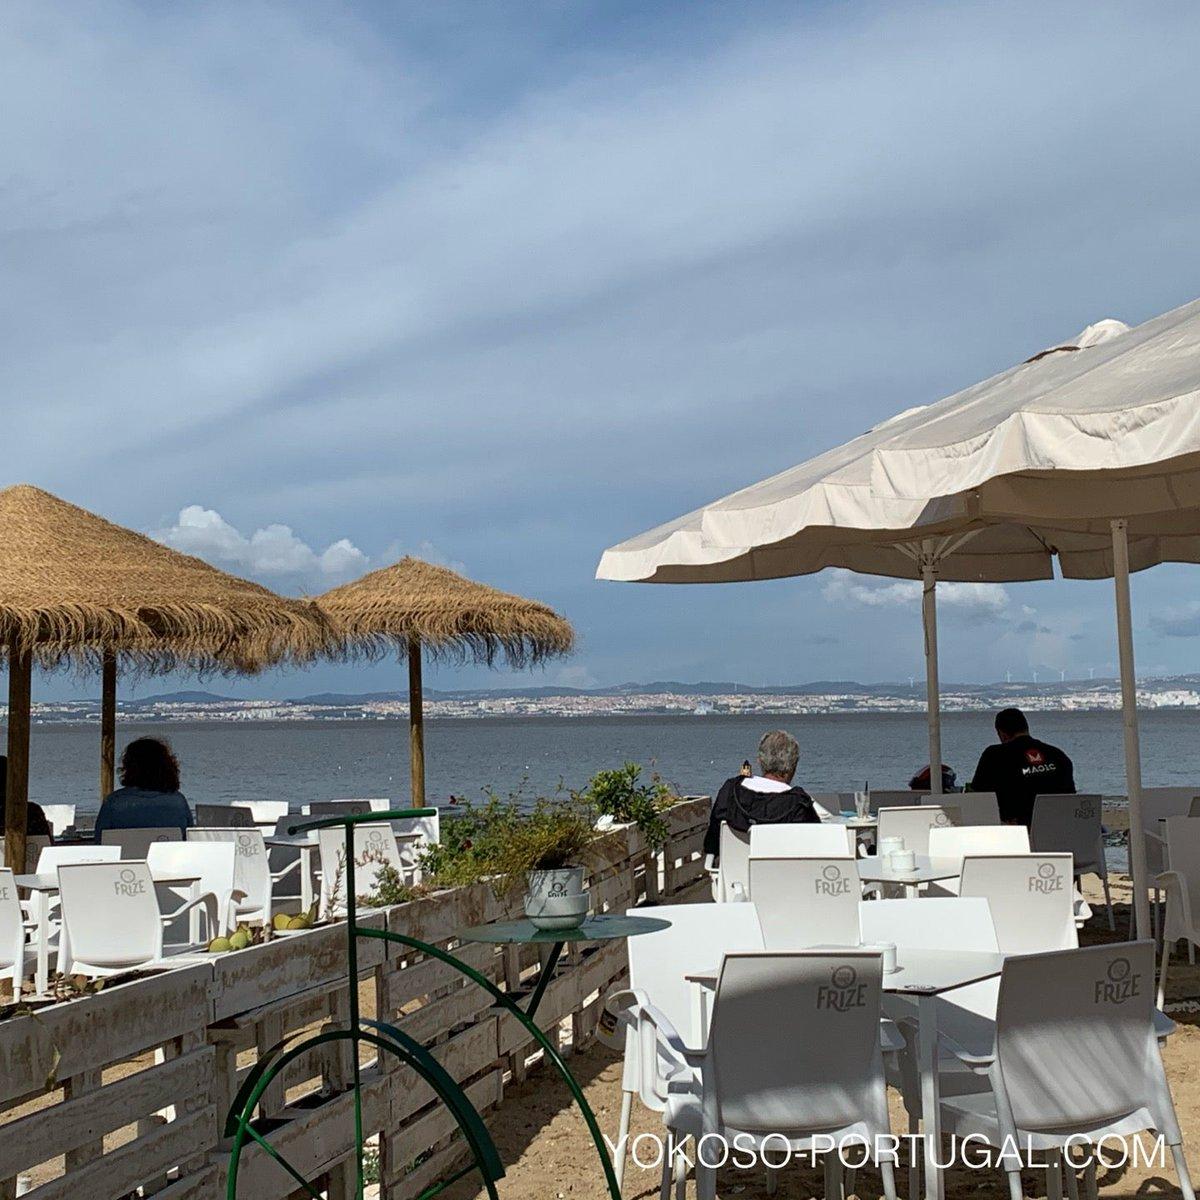 test ツイッターメディア - リスボンの対岸の街、アルコシェッテのカフェ。バスコ・ダ・ガマ橋とリスボンが一望できます。 (@ Snack-Bar PiKolé in Alcochete, Setúbal) https://t.co/eqvzxVPuIZ https://t.co/bQHWVNI5uv